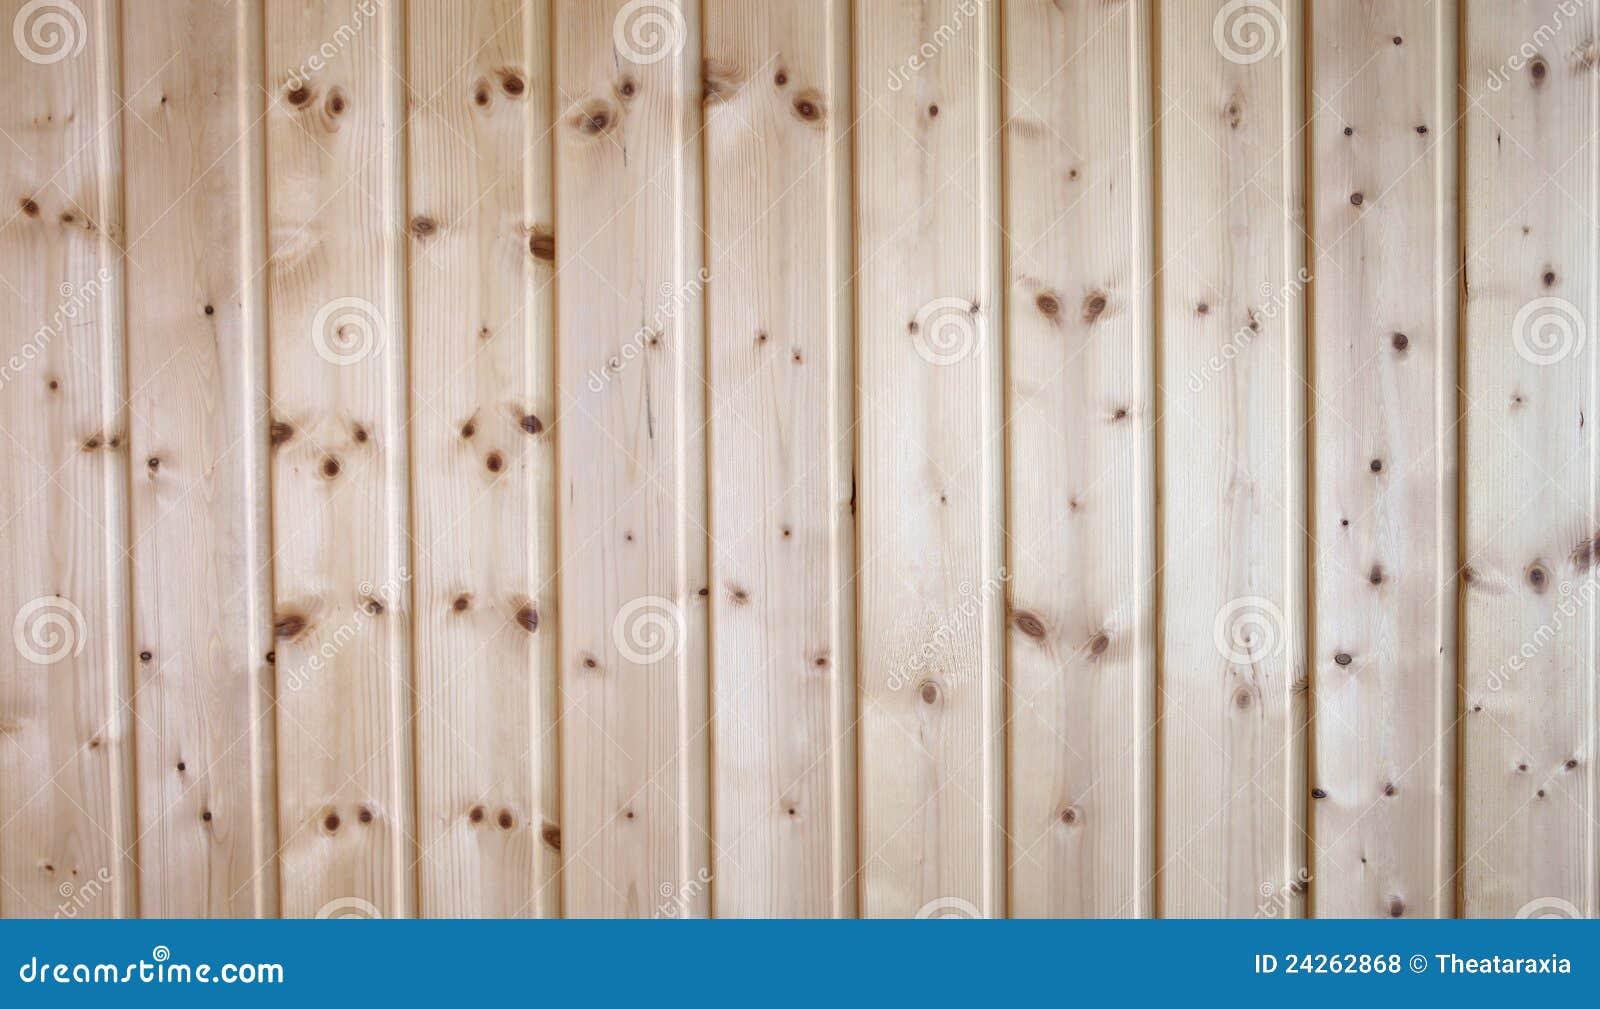 Sauna holz wand lizenzfreie stockfotos bild 24262868 for Planchas de madera para paredes